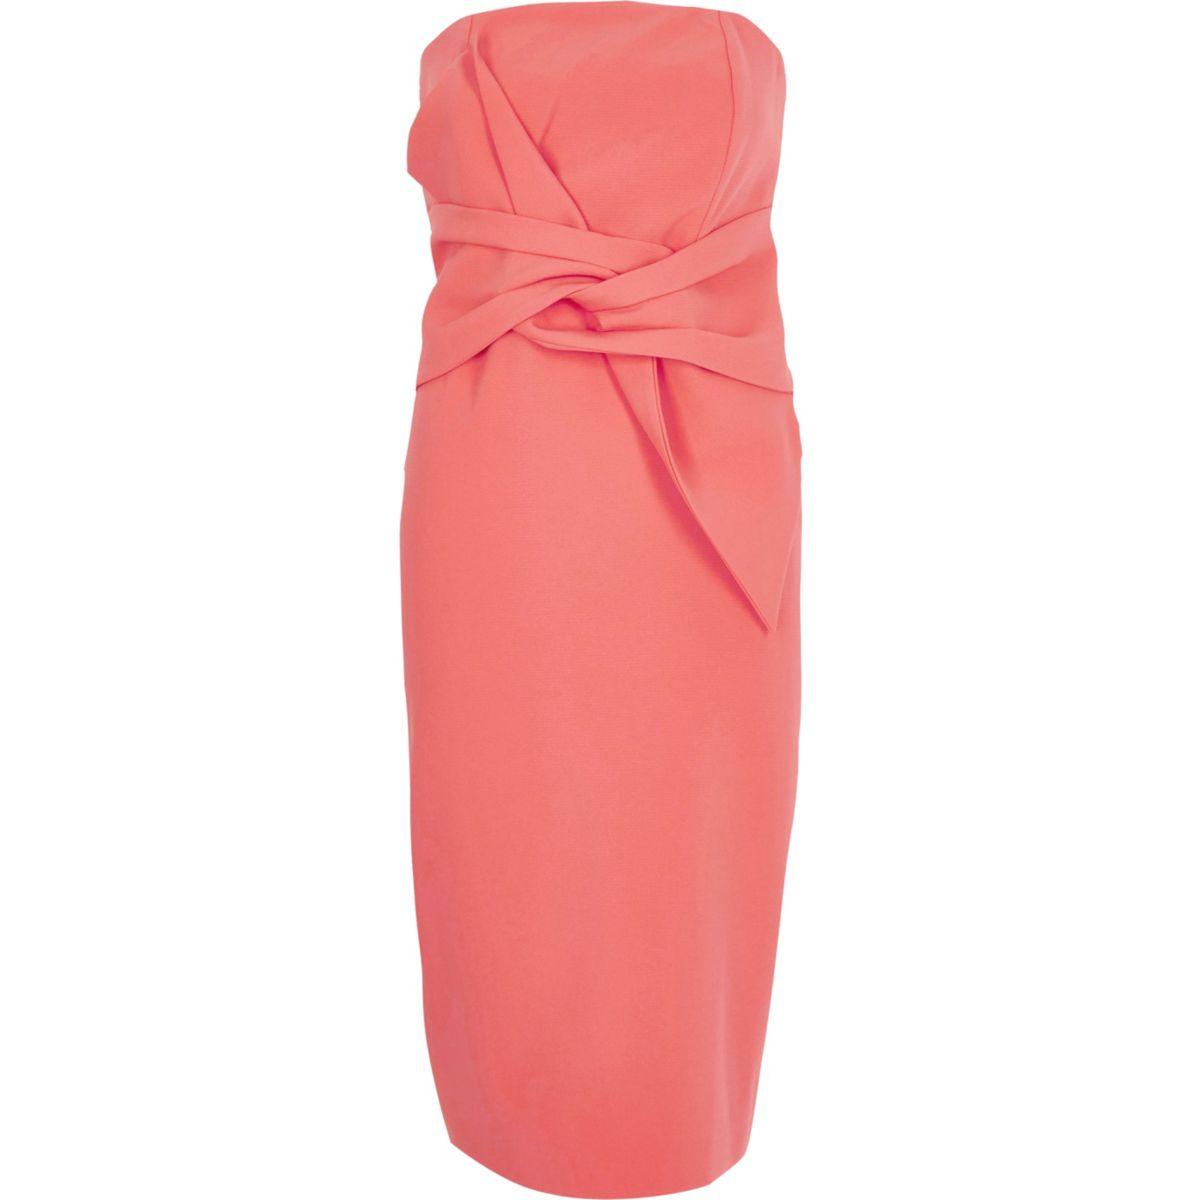 Coral twist bandeau bodycon dress